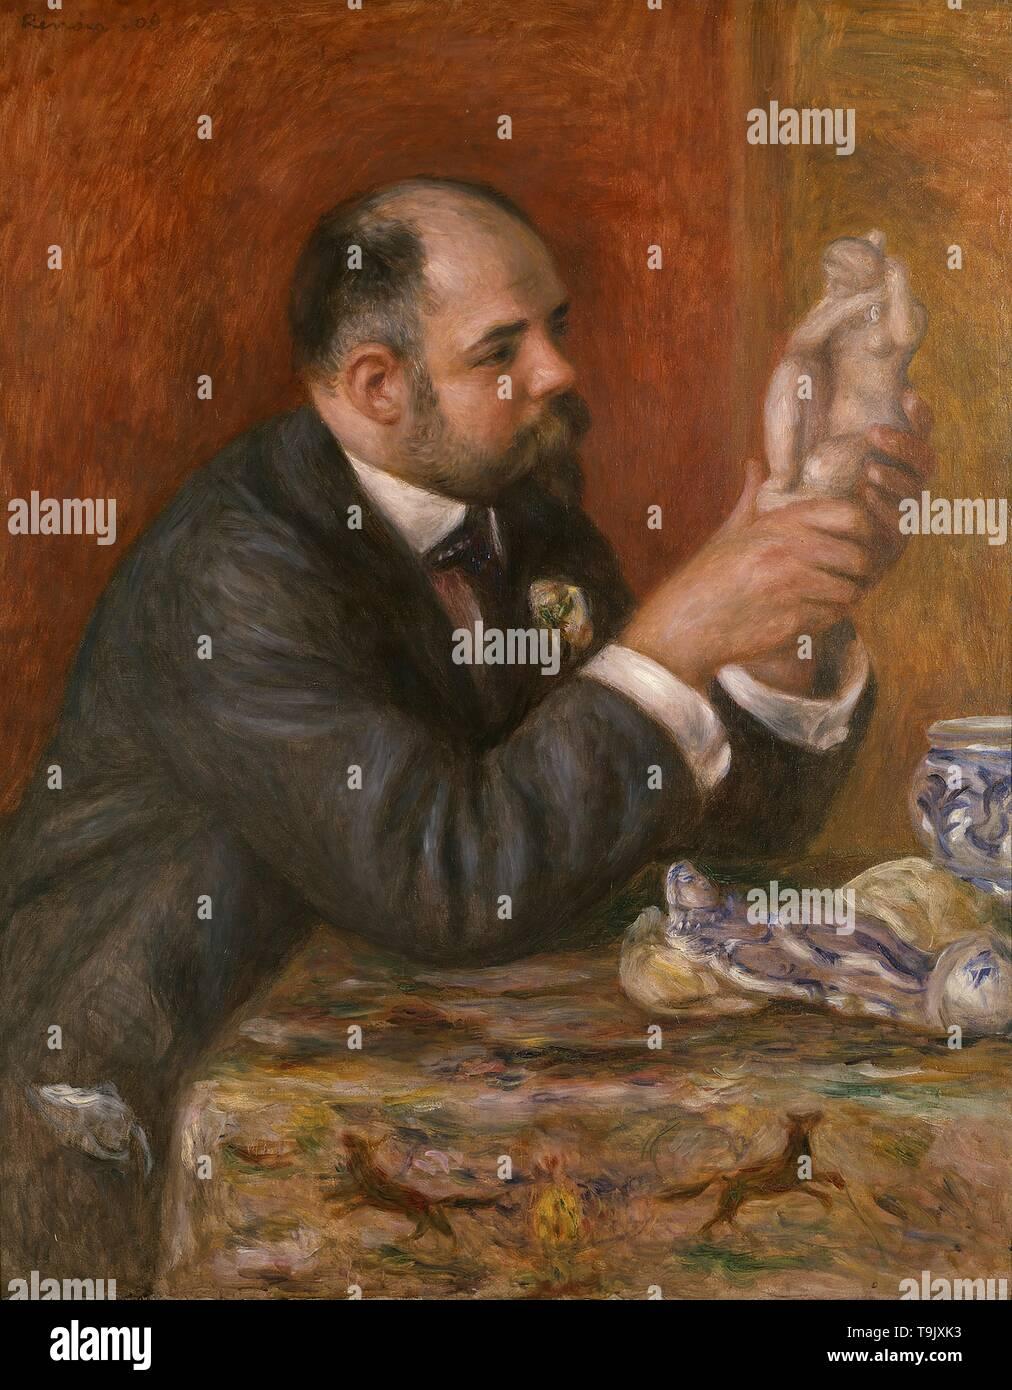 Portrait of Ambroise Vollard (1865-1939). Museum: Courtauld Institute of Art, London. Author: Pierre-Auguste Renoir. - Stock Image